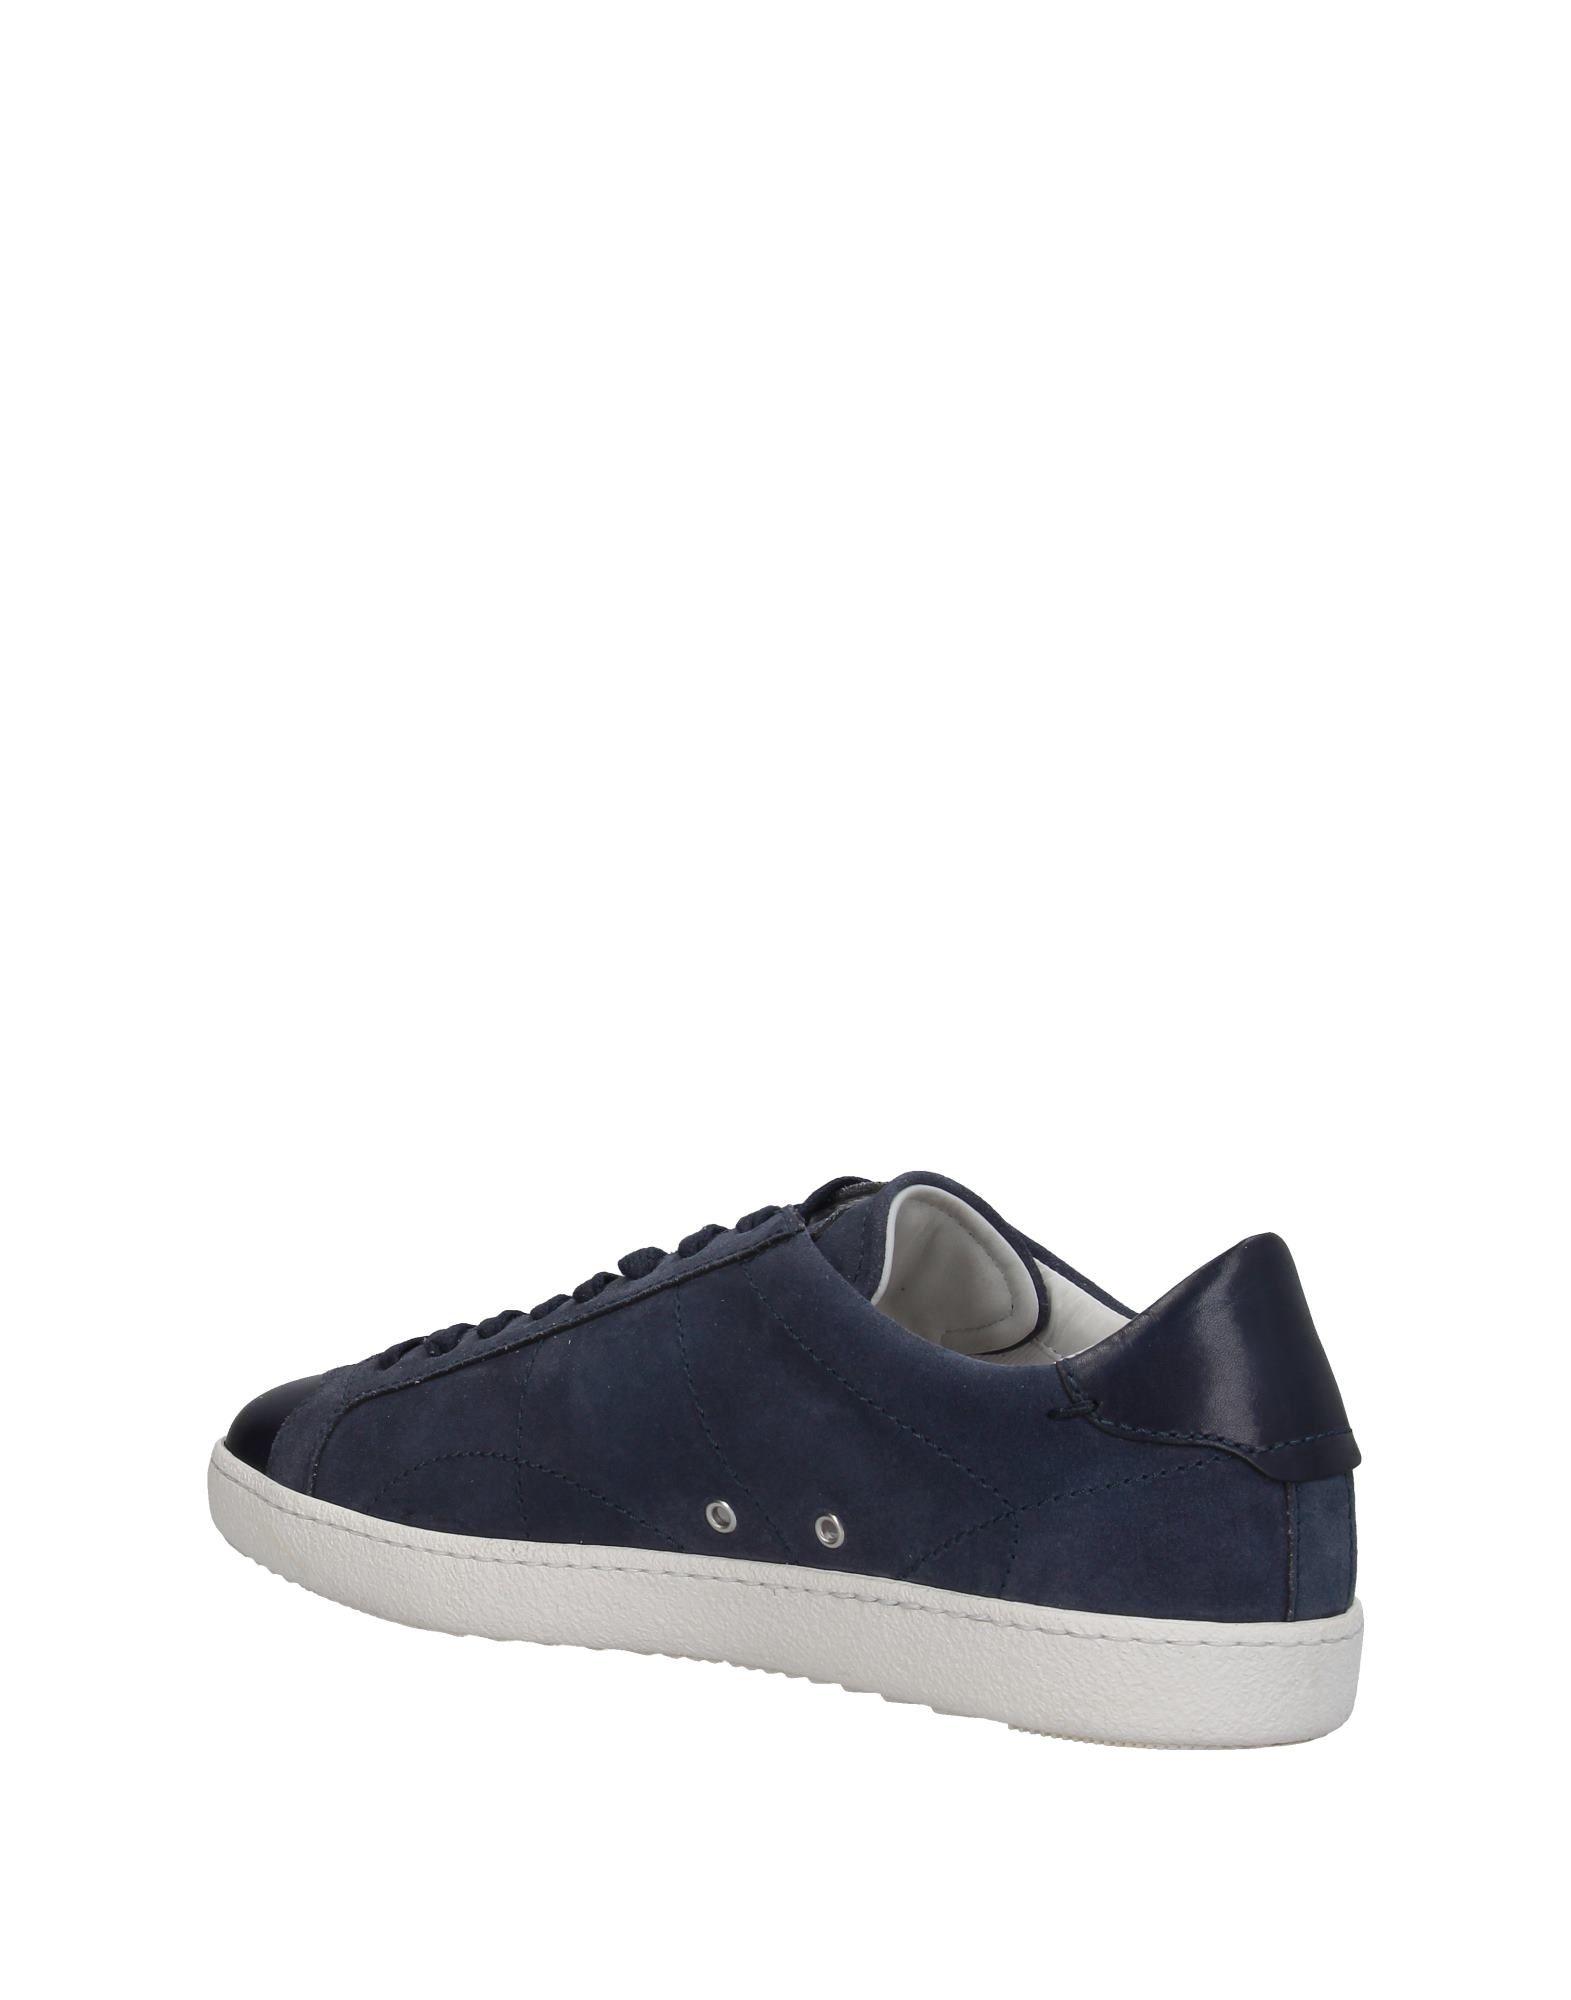 Santoni Heiße Sneakers Herren  11410114OH Heiße Santoni Schuhe 723c95